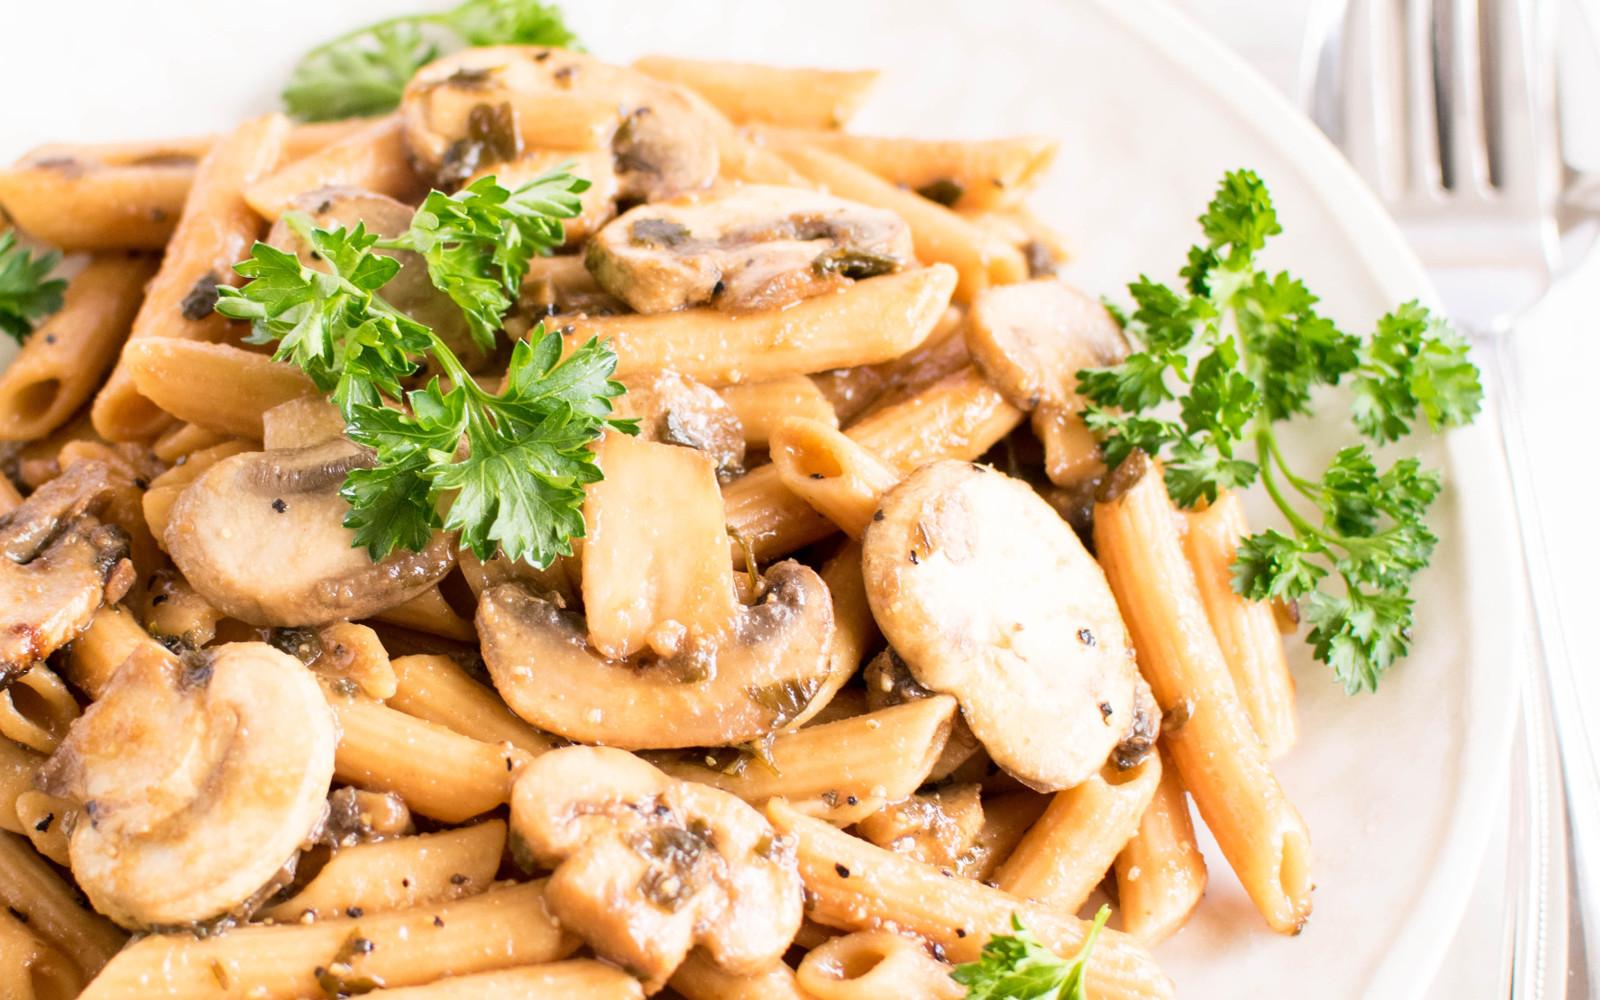 Pasta Mushroom Stir Fry